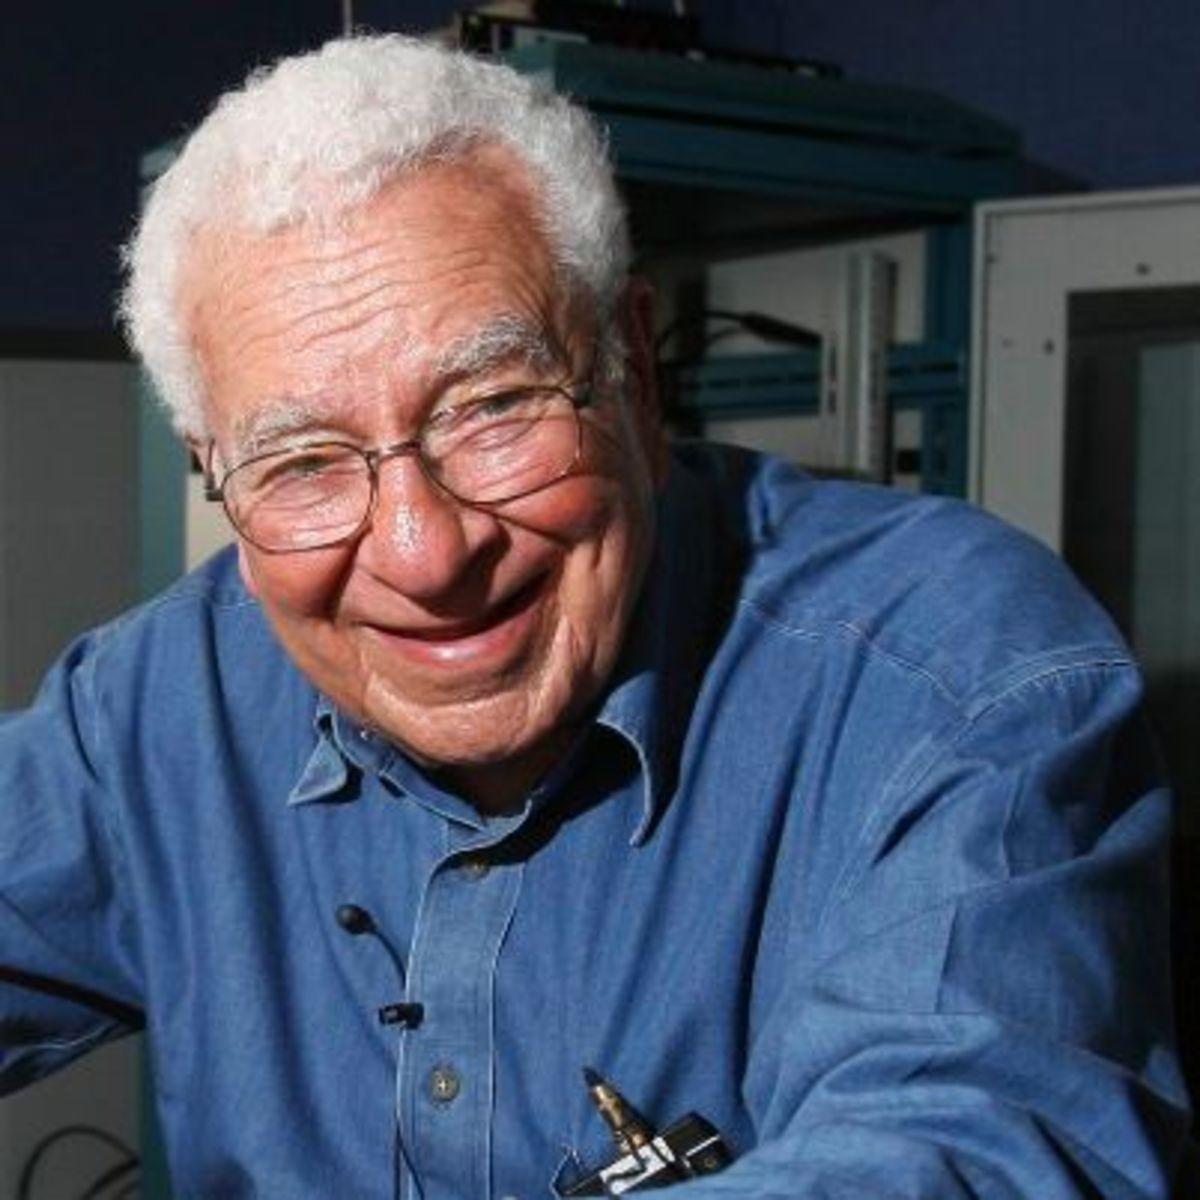 Murray Gell-Mann - Physicist, Nobel Prize Winner